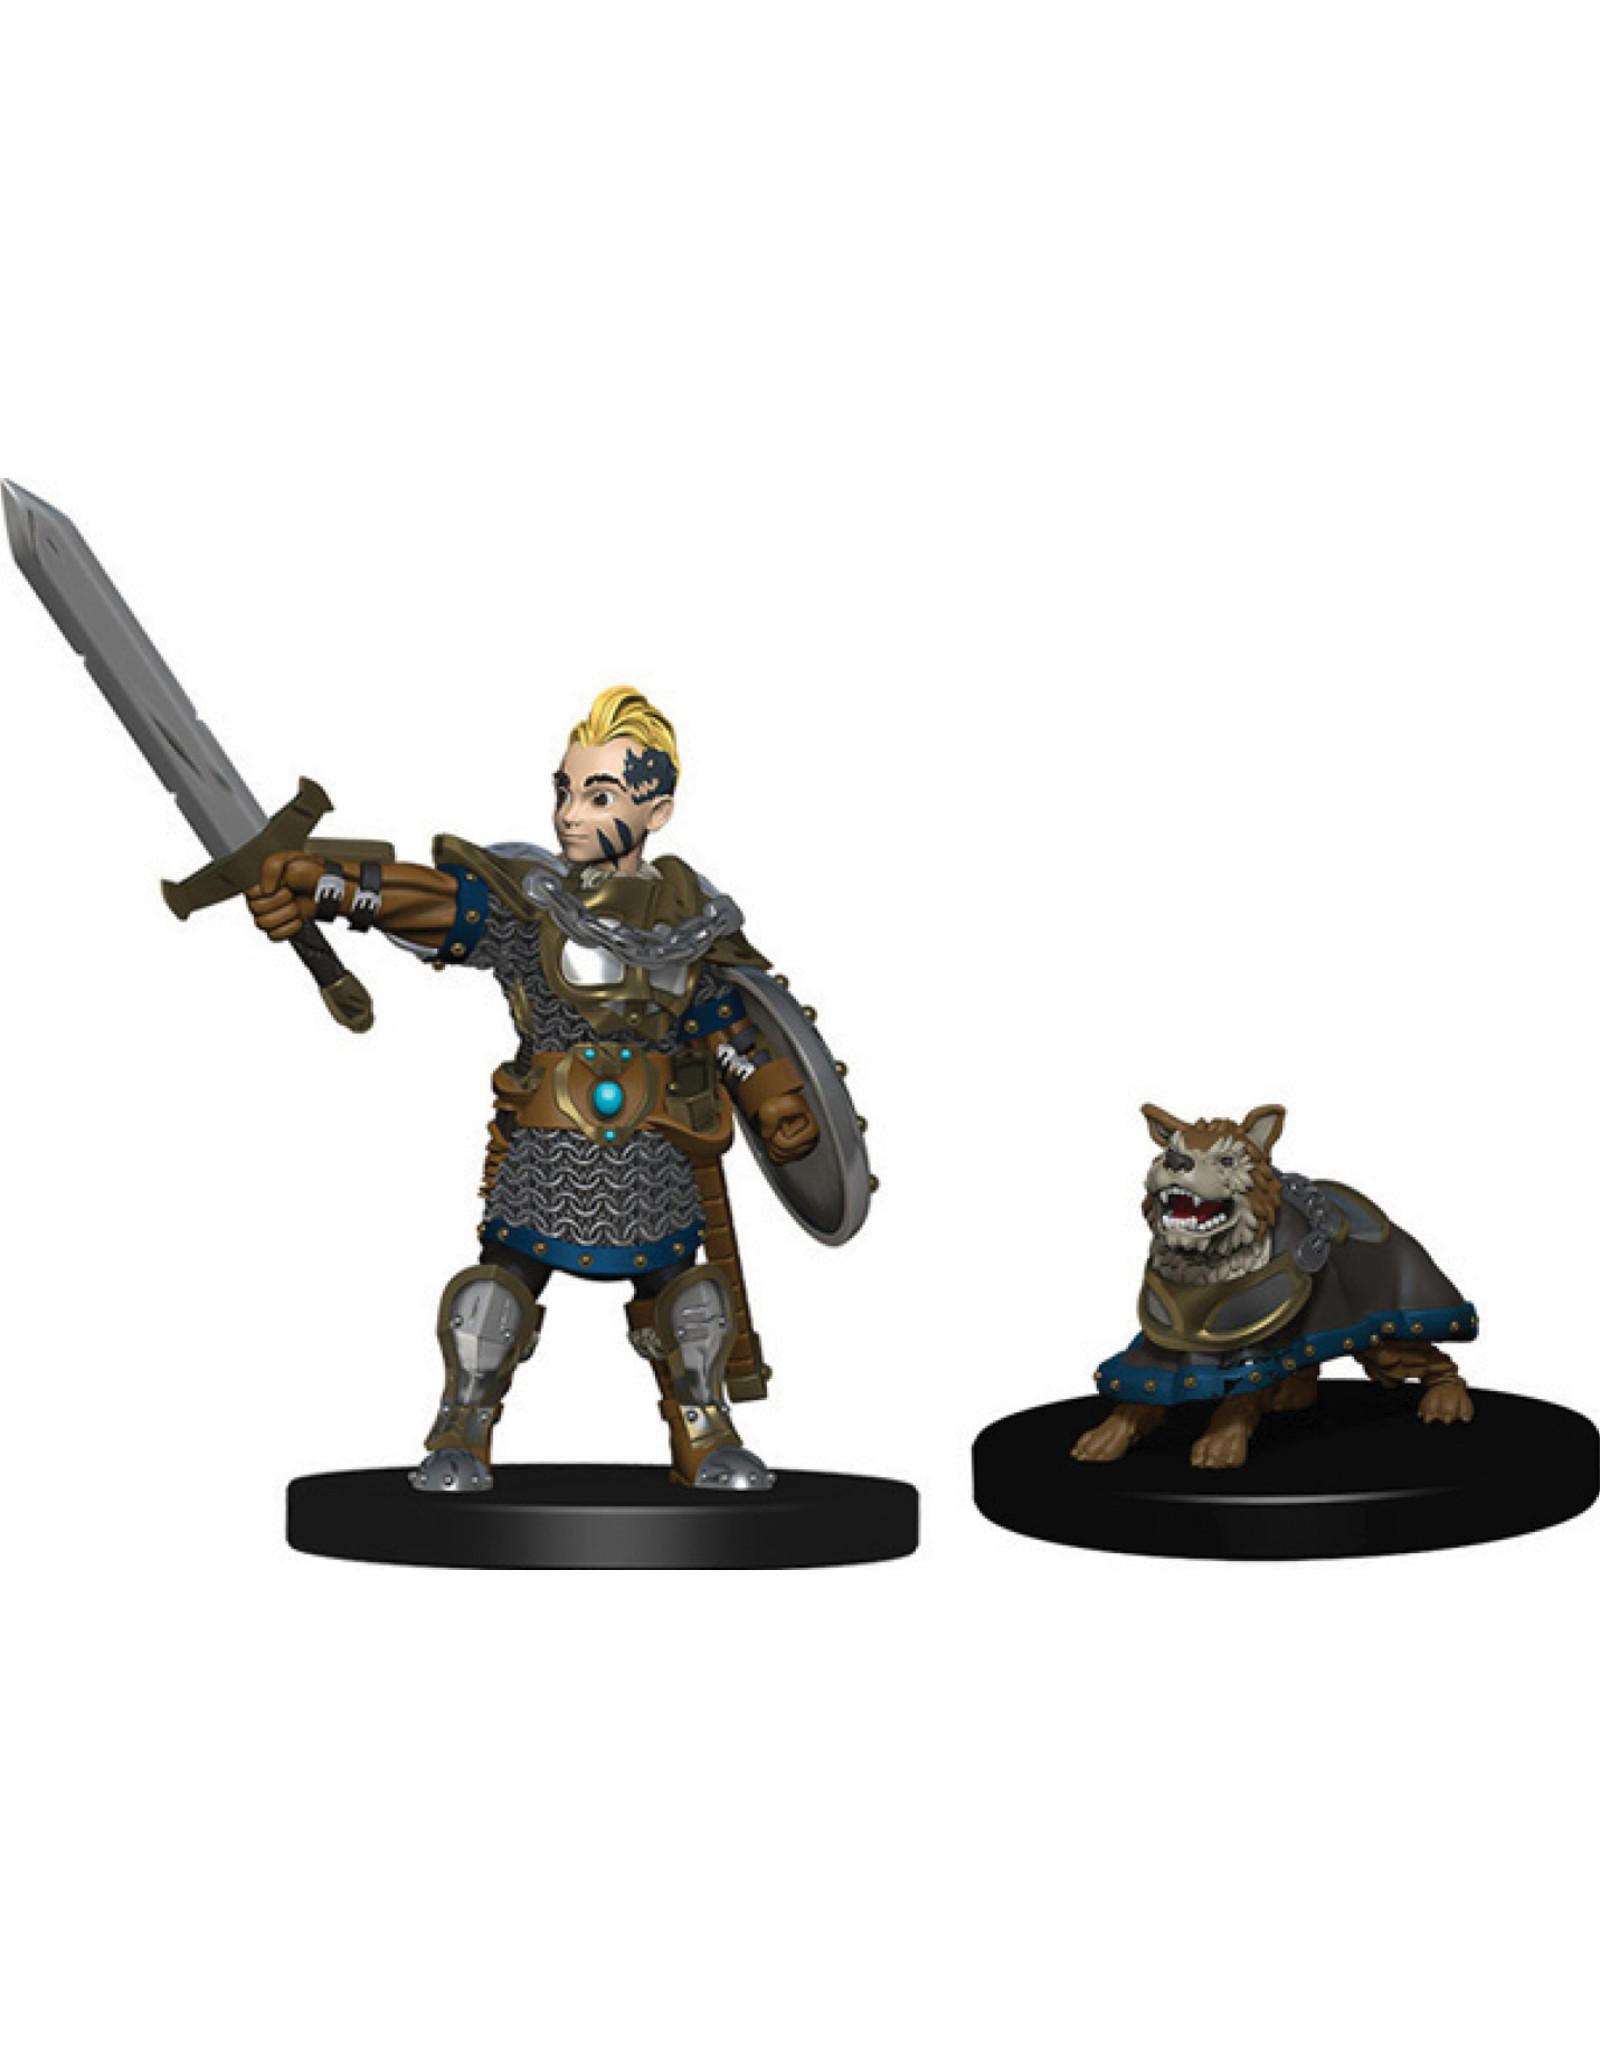 Wiz Kids Wardlings: Boy Fighter & Battle Dog